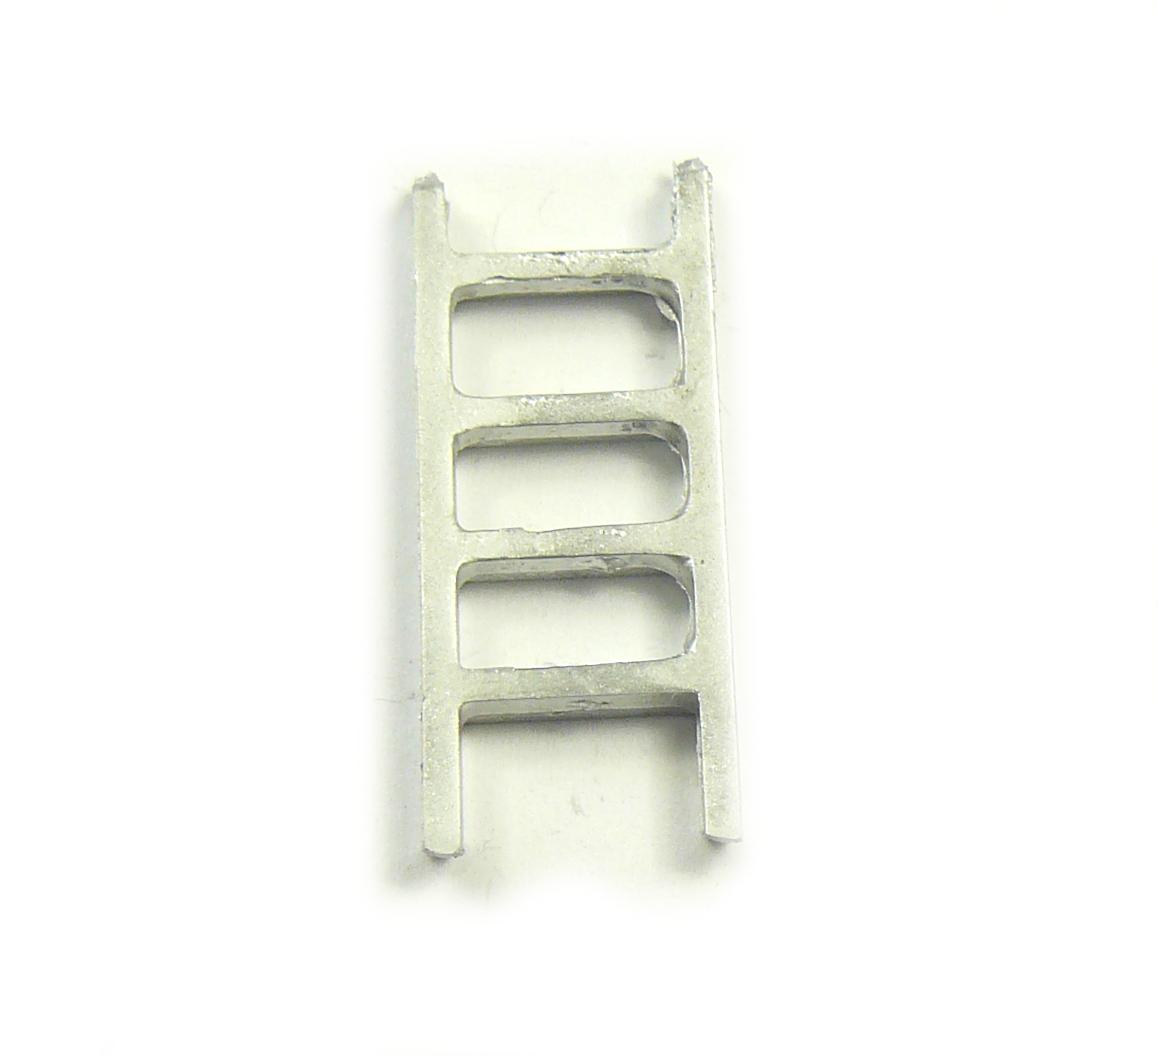 2 x White Metal Ladder 31 x 12mm